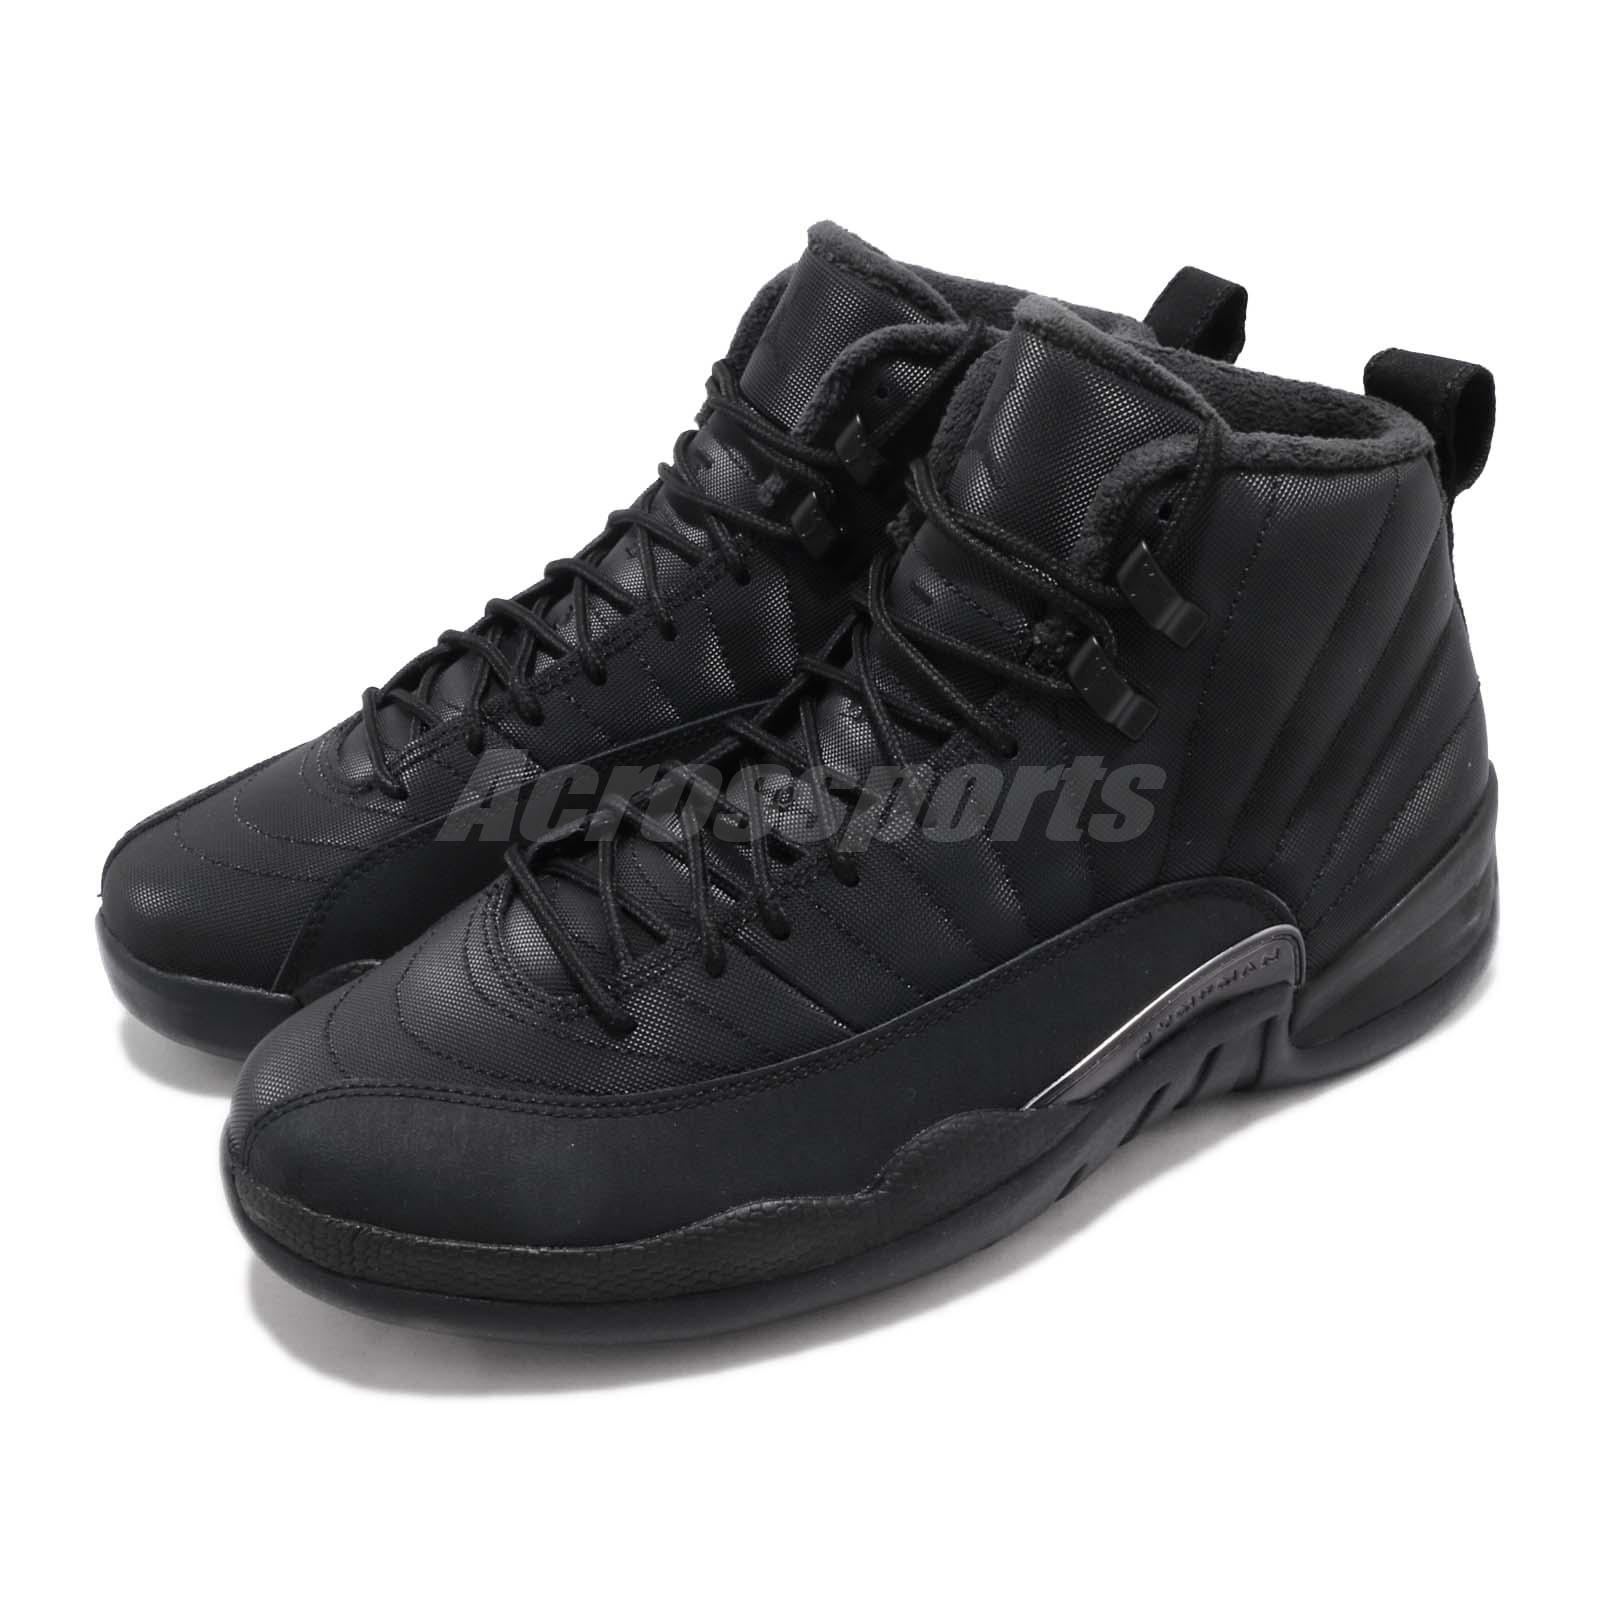 effed982549d2f Details about Nike Air Jordan 12 Retro WNTR Winterized AJ12 XII Black Men  Shoes BQ6851-001